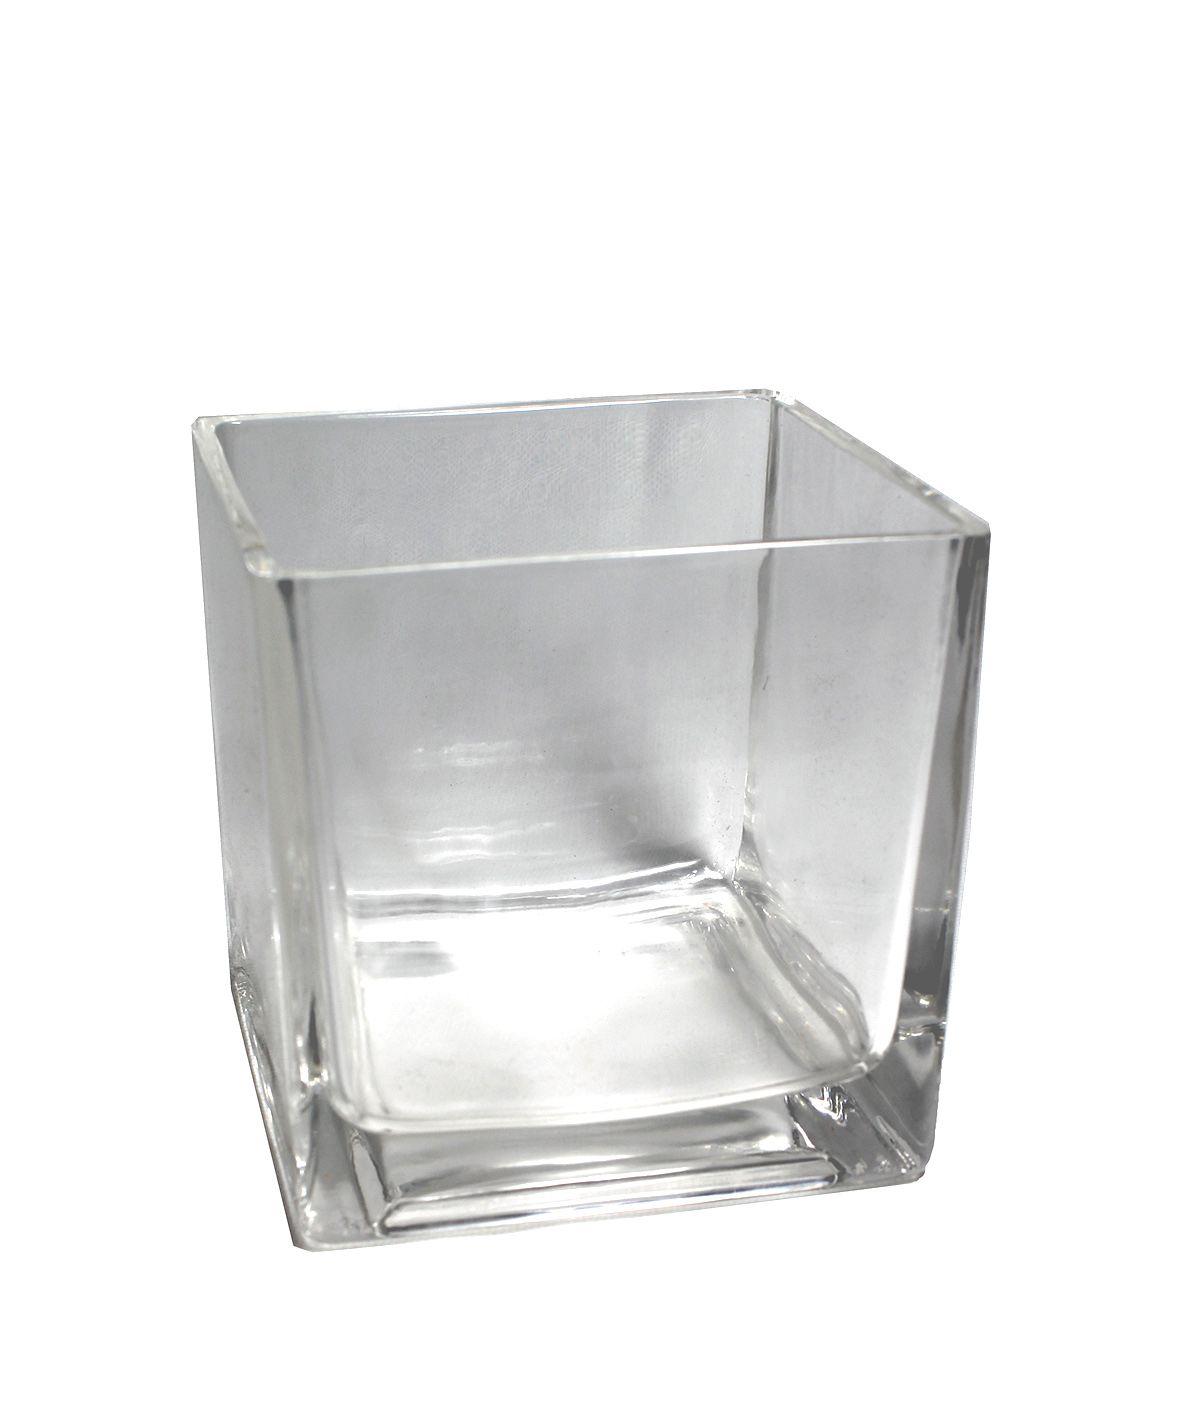 Vaso De Vidro Quadrado Médio - 15Cm  Altura X  15 Cm Boca